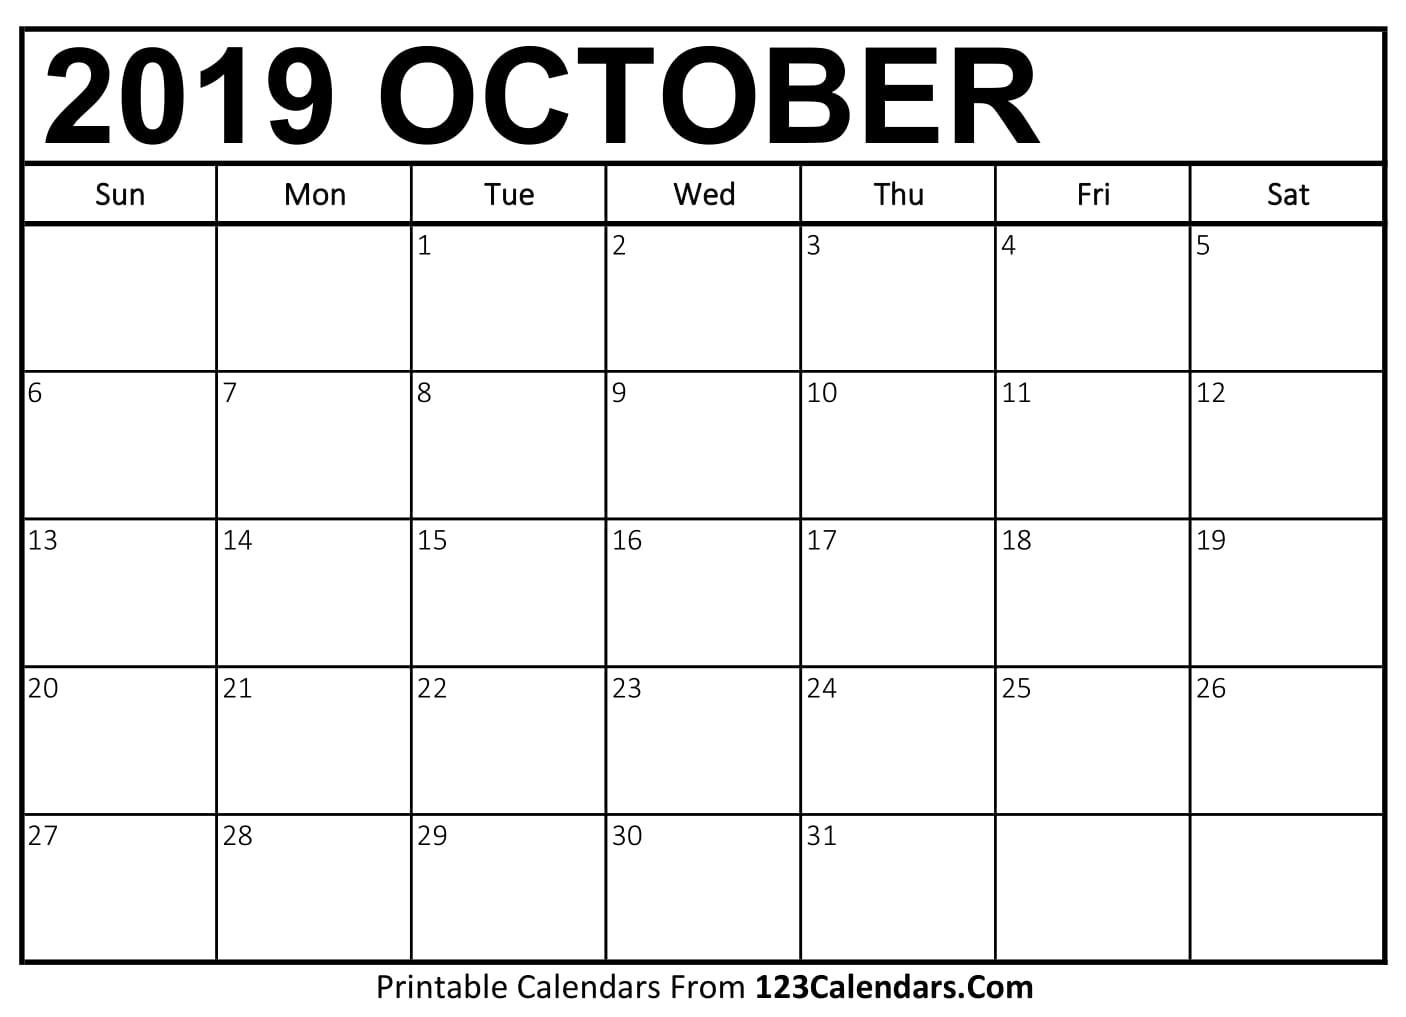 October 2019 Printable Calendar | 123Calendars in Editable October 2019 Calendar With Religious Holidays